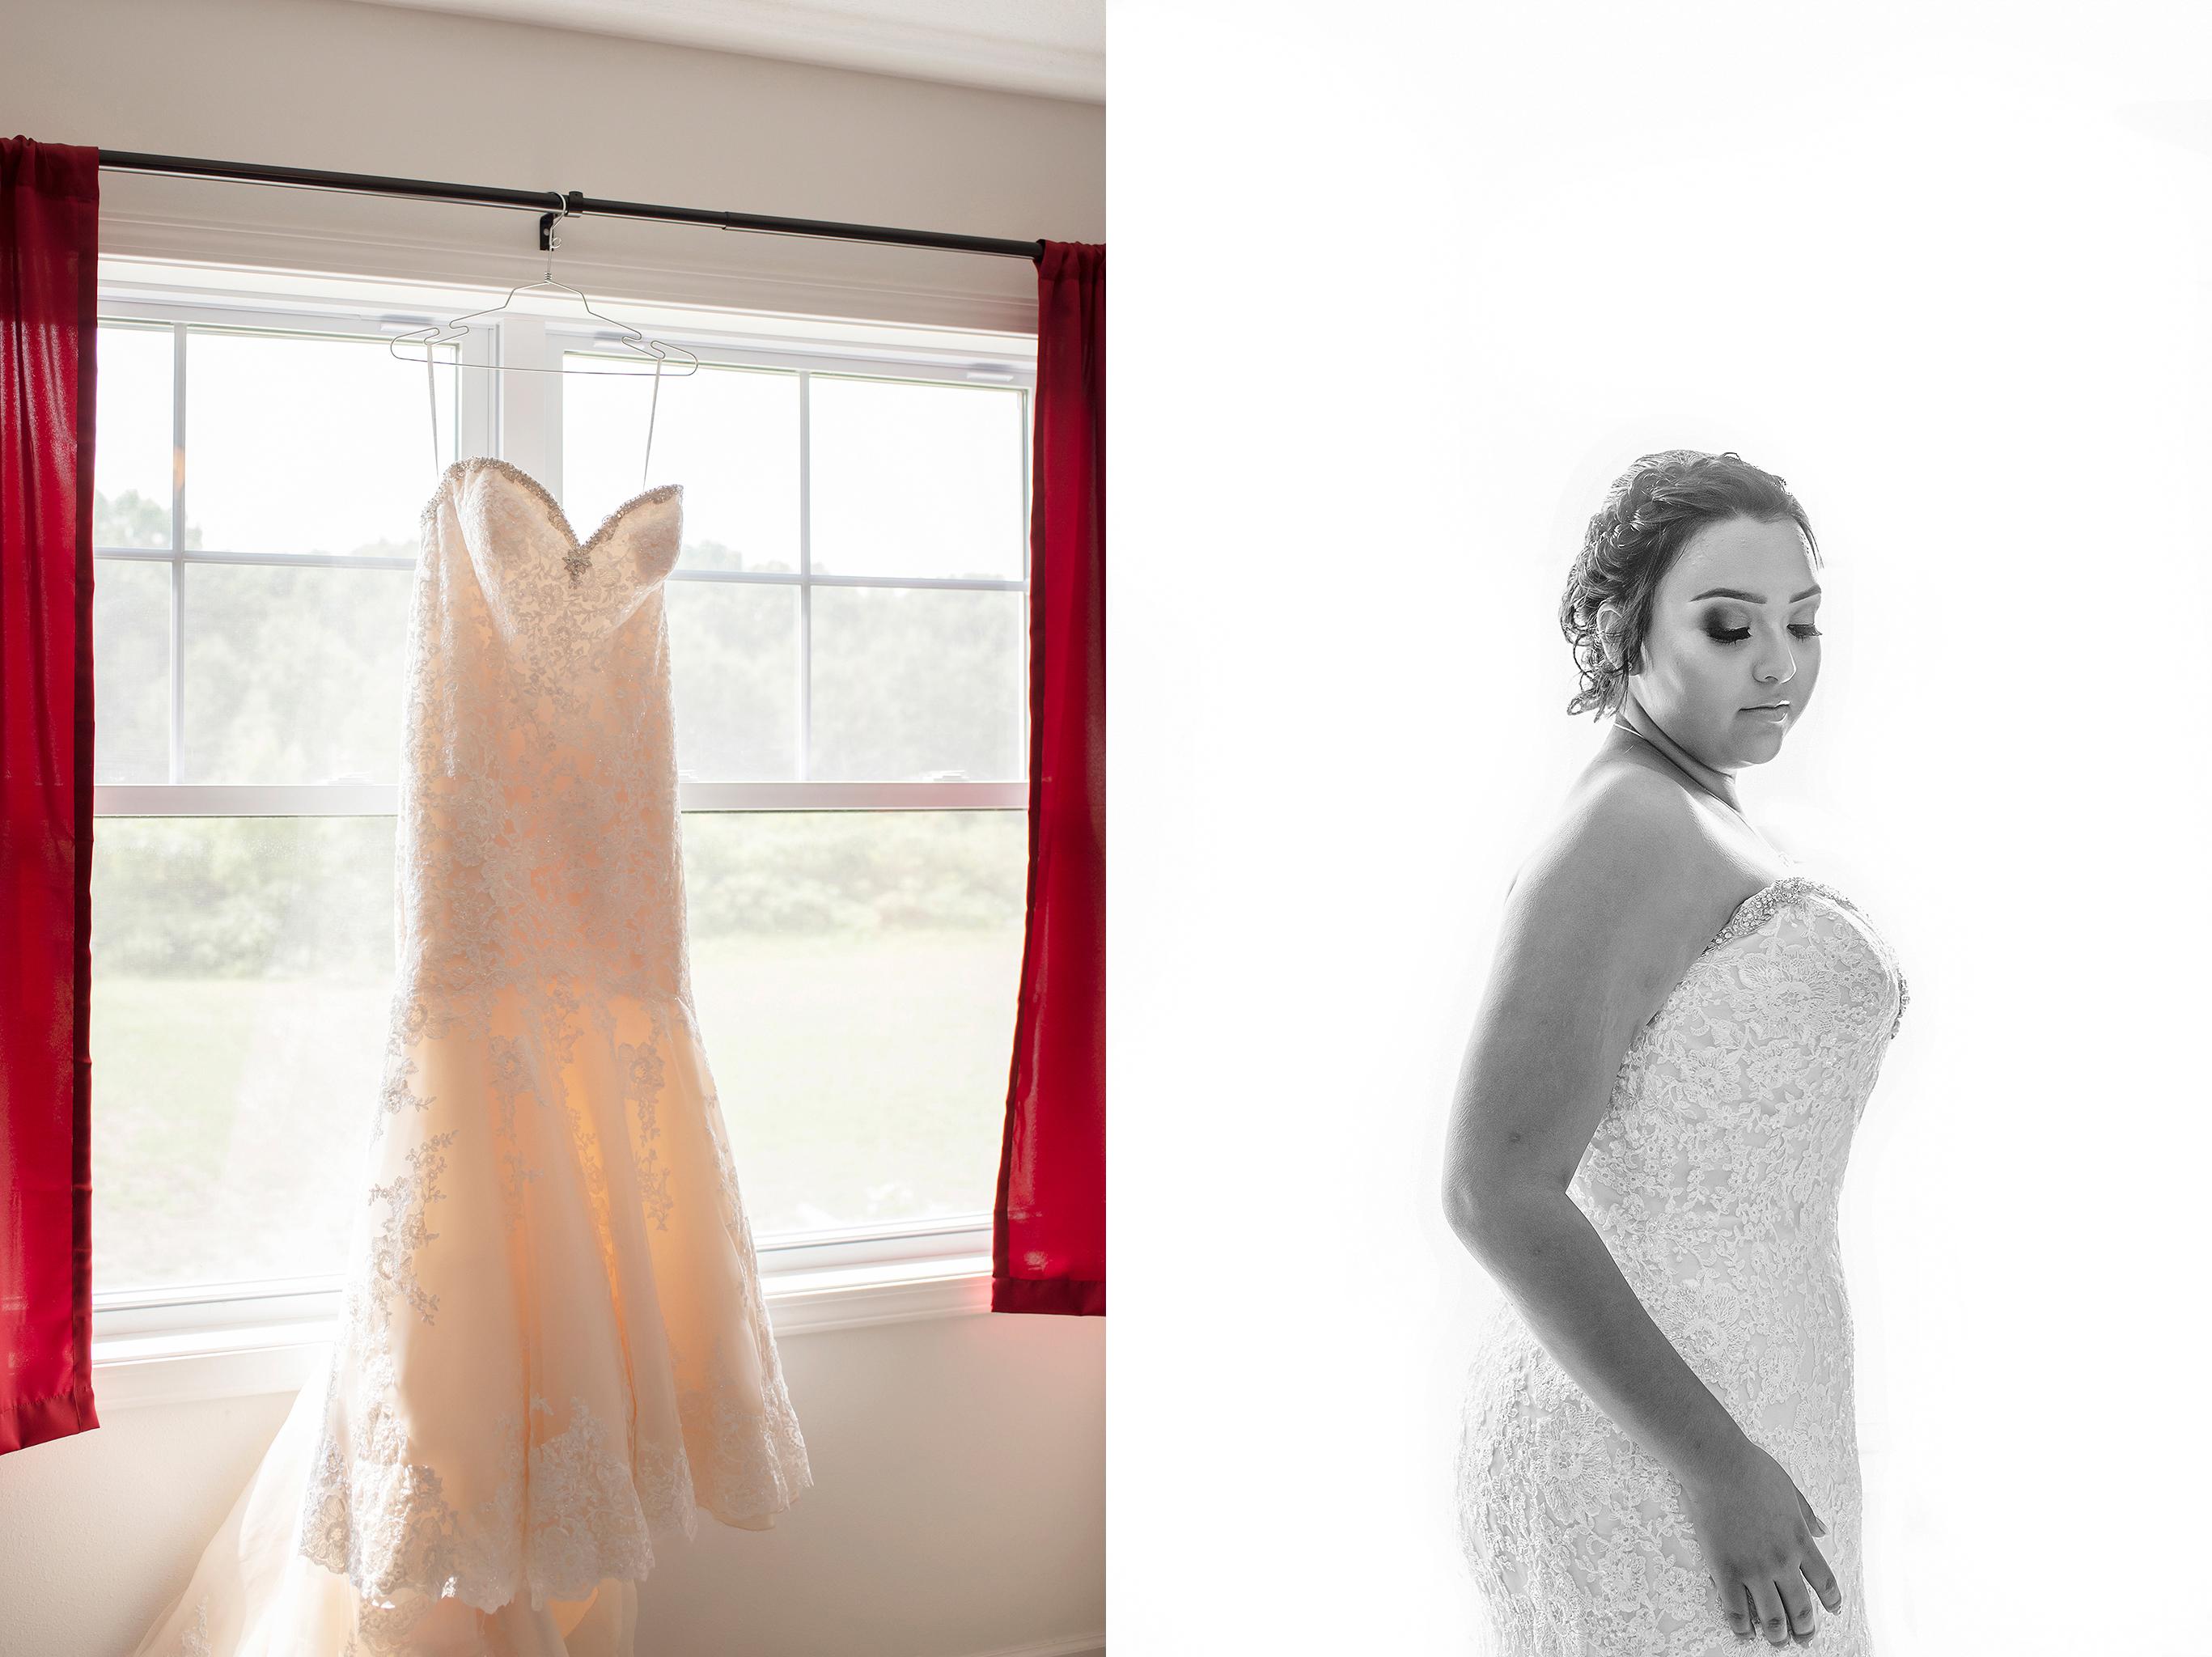 Lindsay-Adkins-Photography-Michigan-Wedding-Photographer-BernalBlog-22